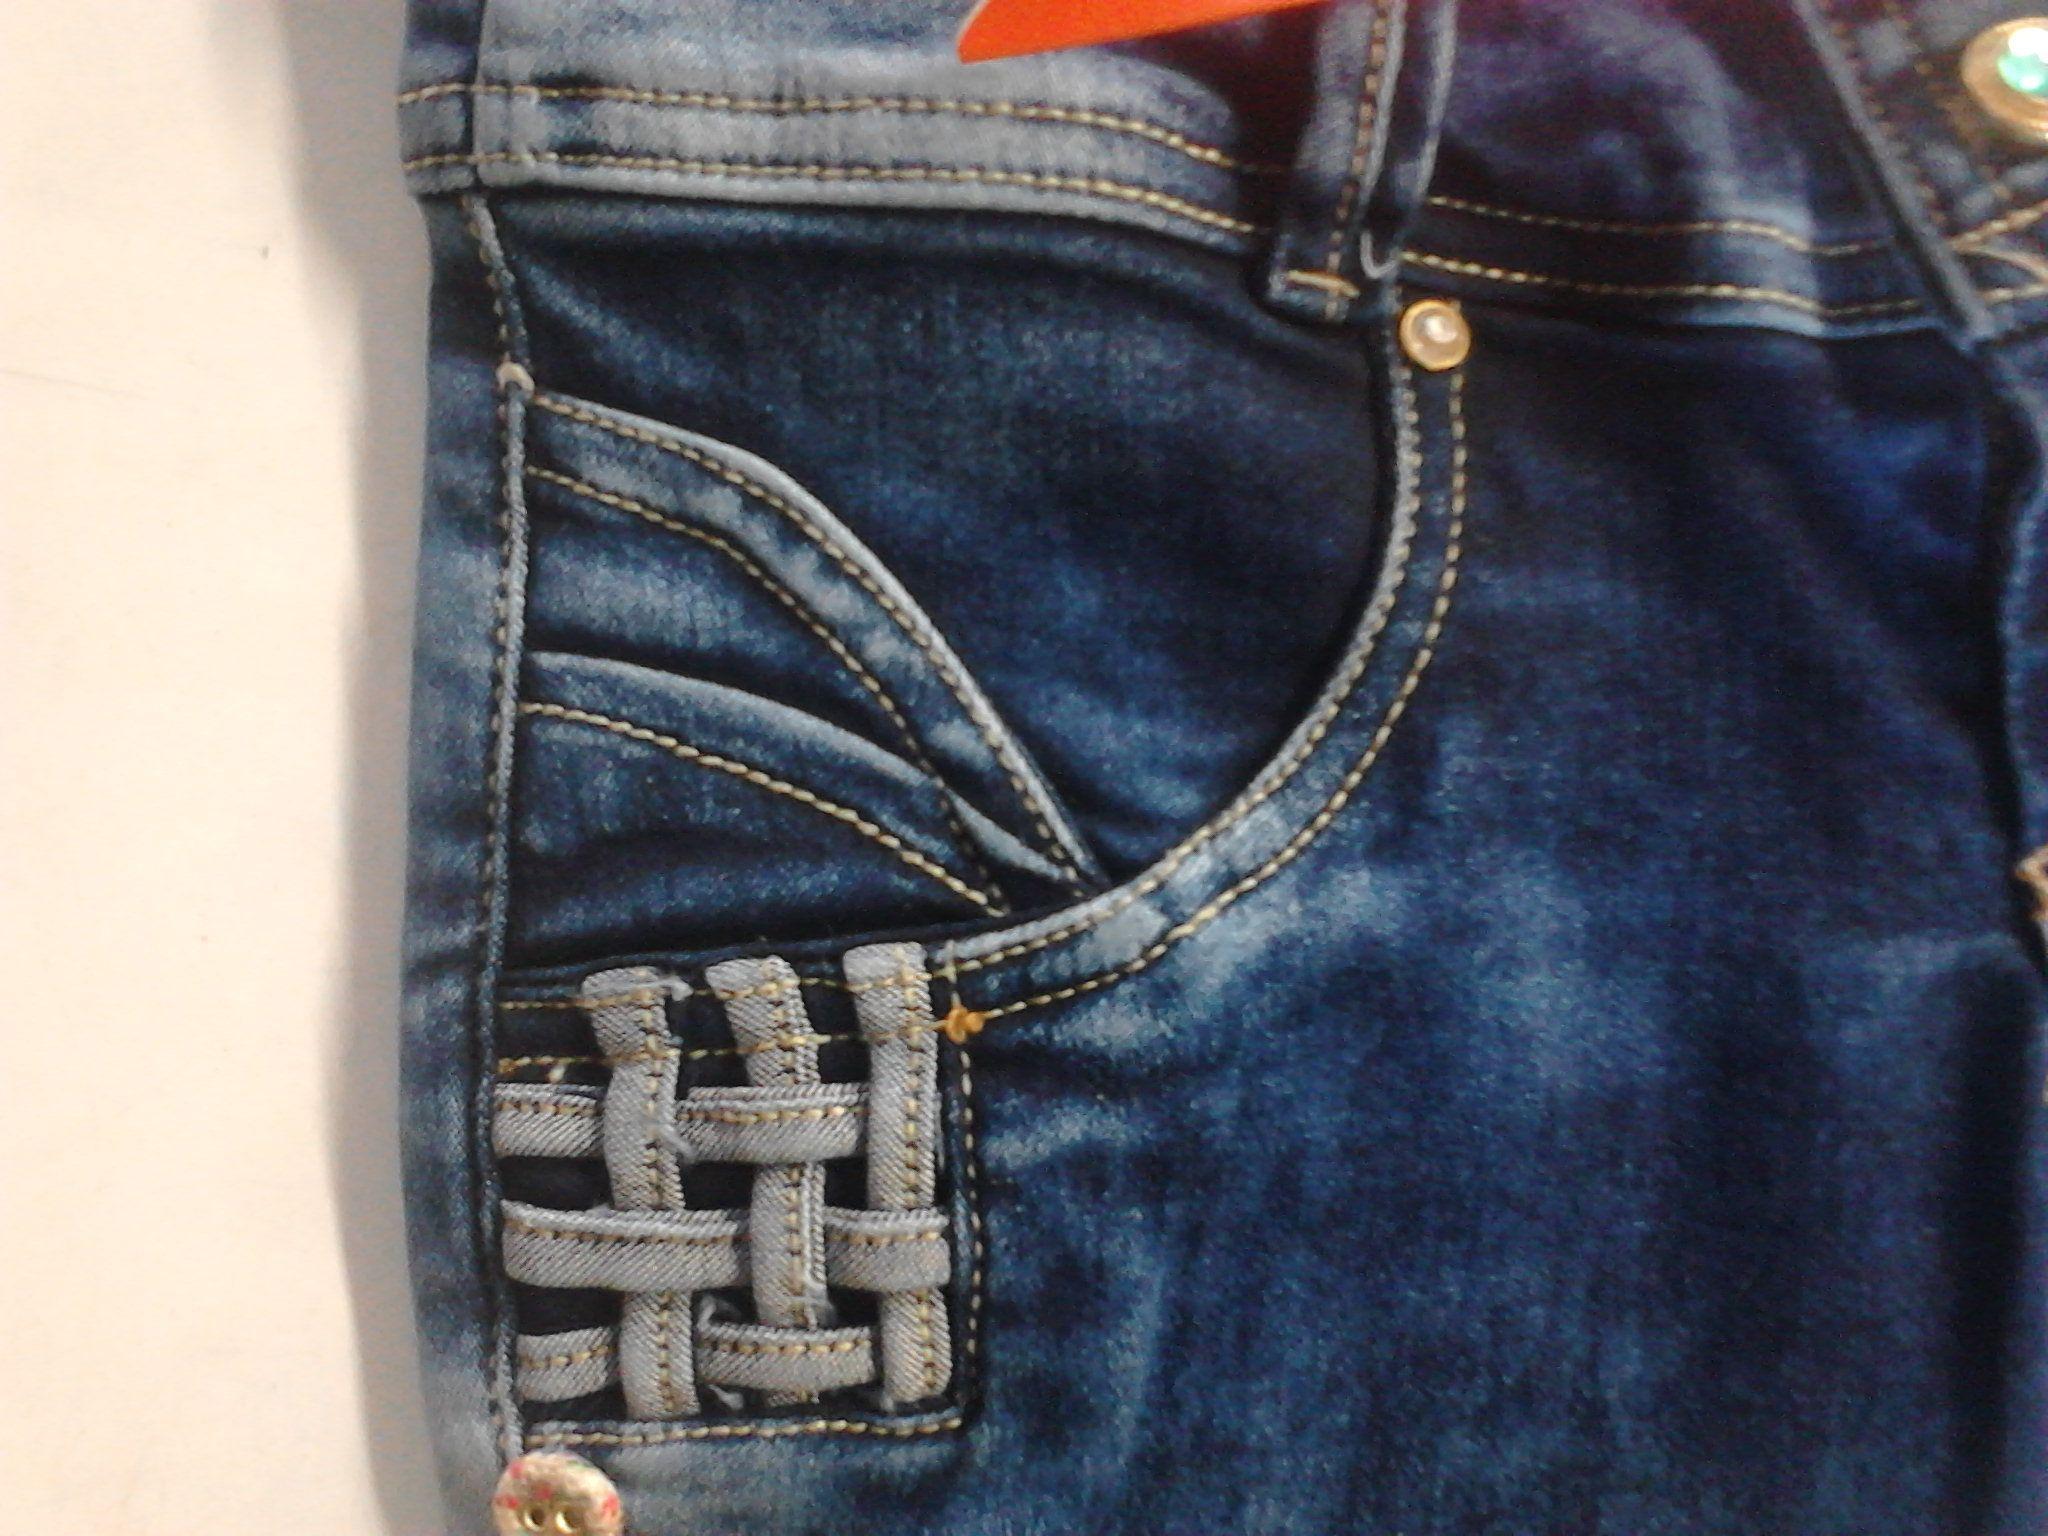 diseño de #pantalon jeans #modazeus pretina anatomica, y tiras en contraste en reboque bolsillo